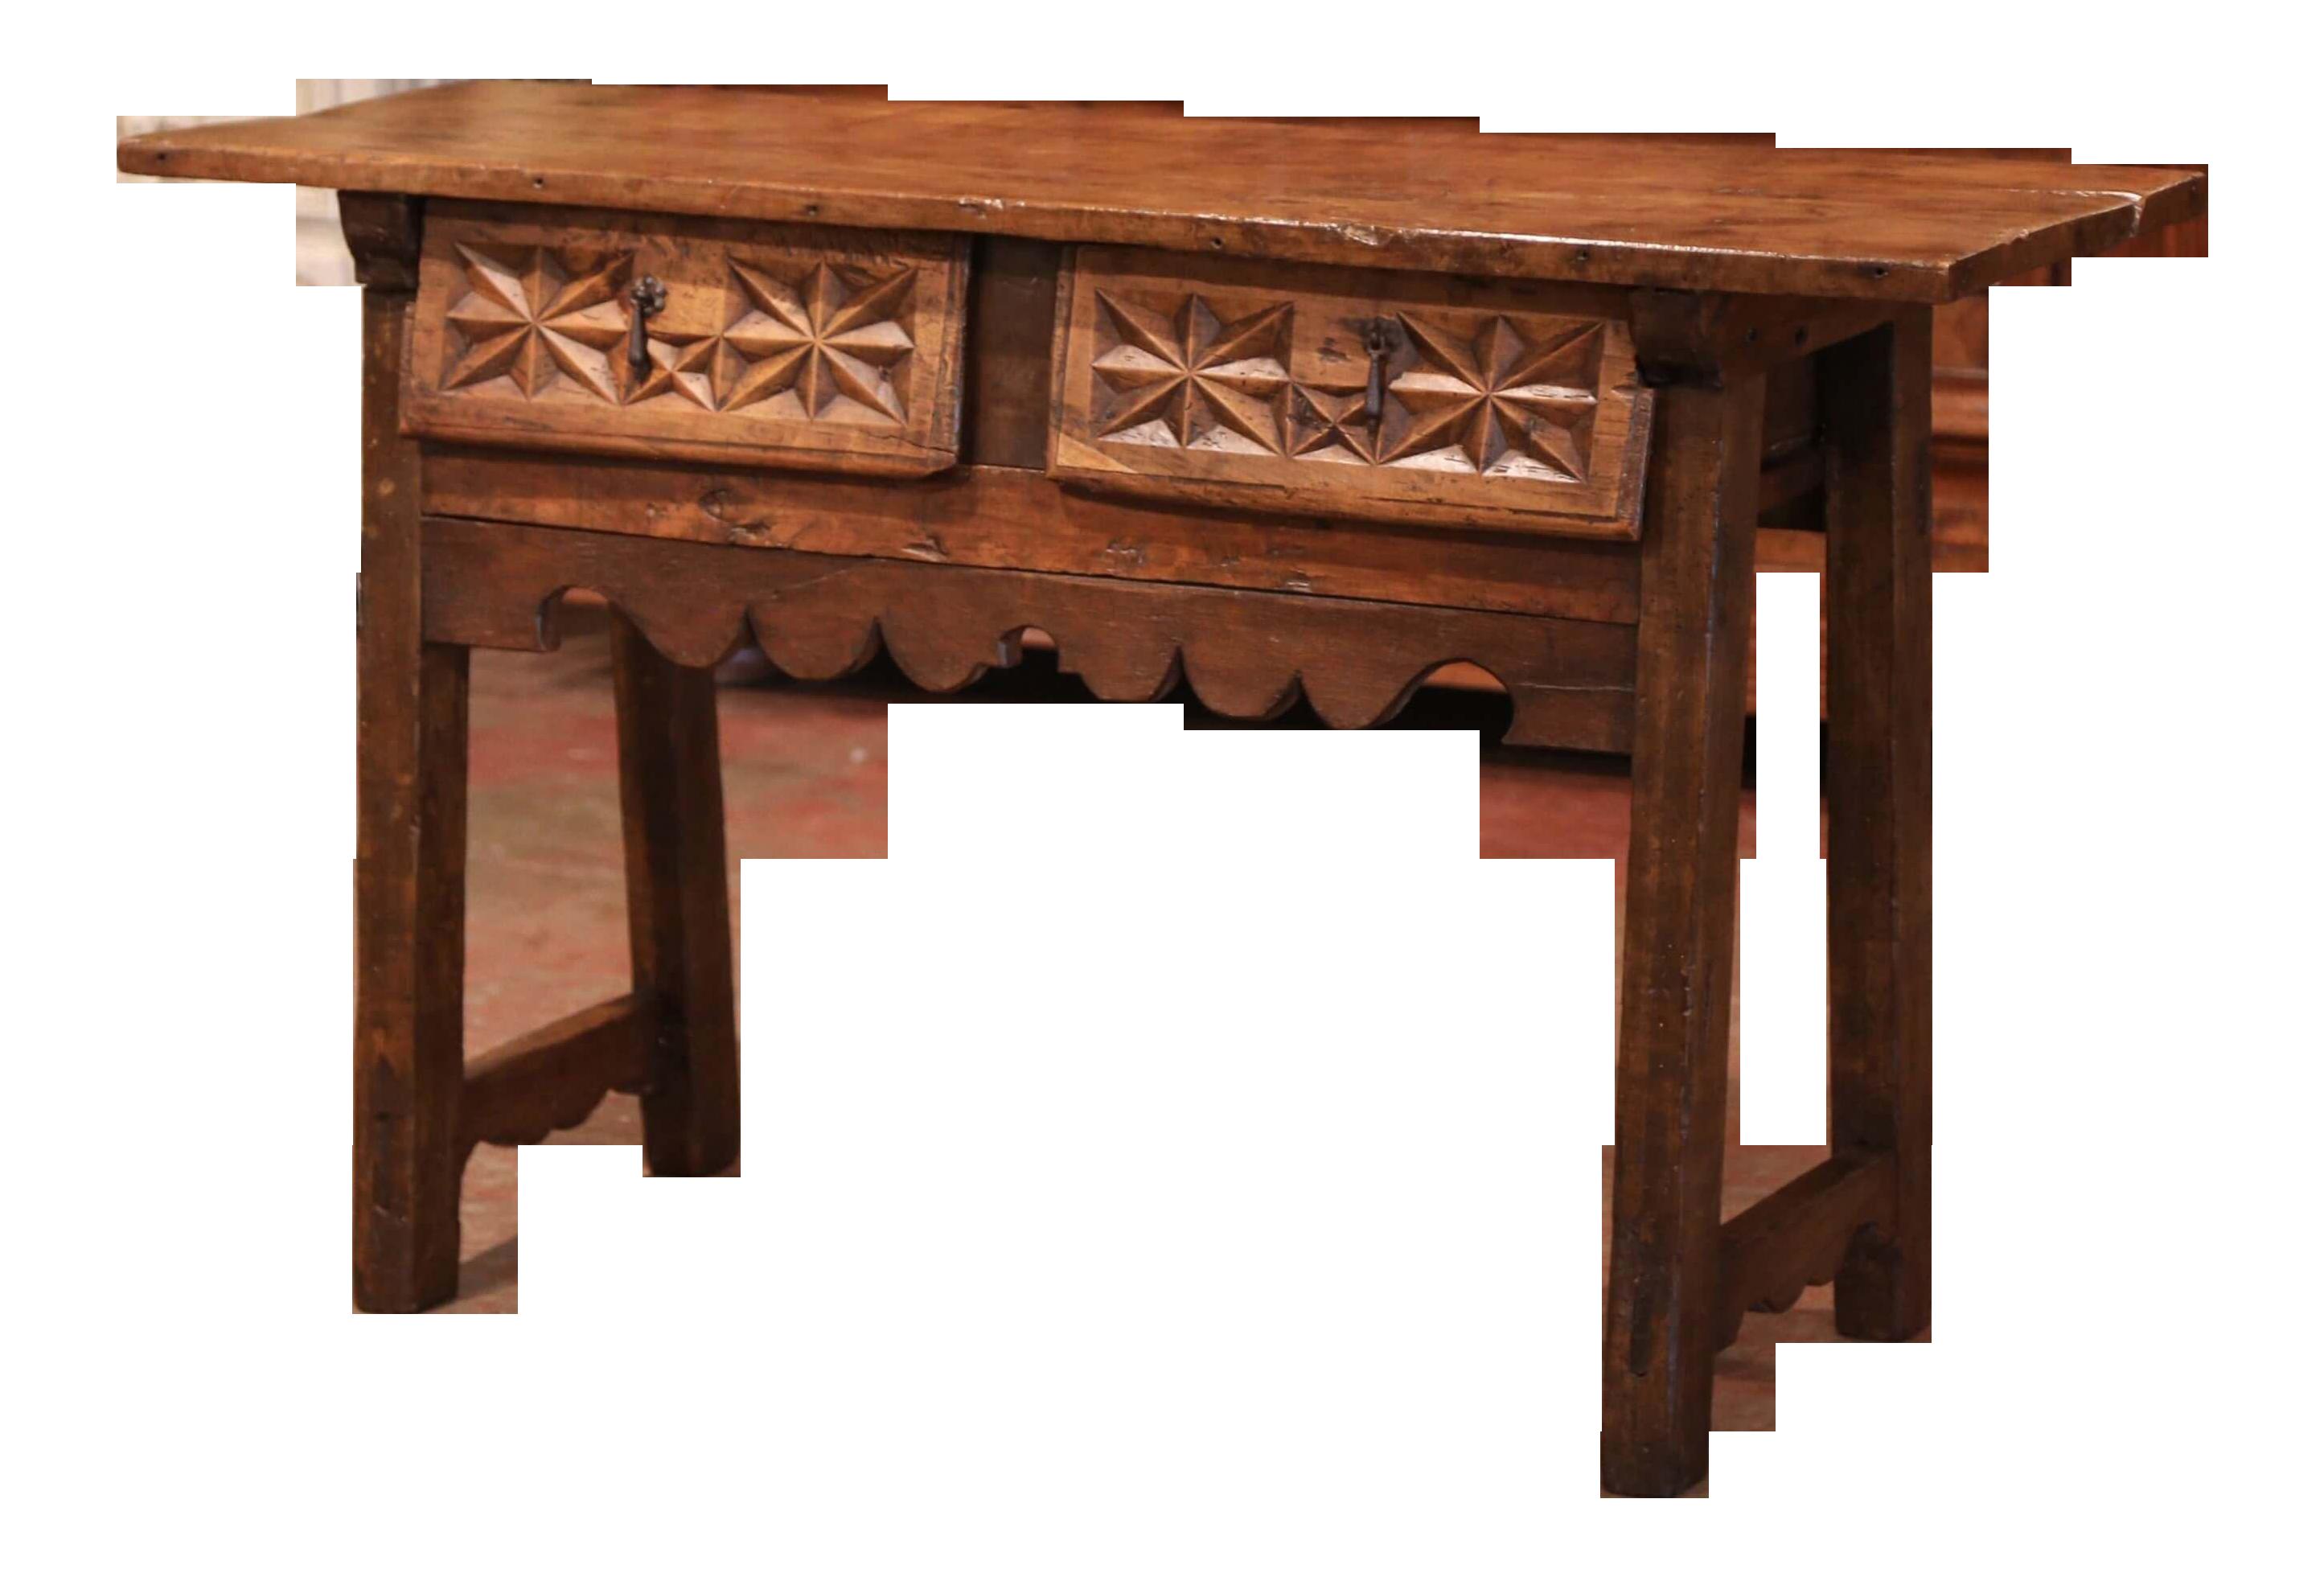 Fine 18Th Century Spanish Carved Walnut Trestle Console Sofa Table With Drawers Creativecarmelina Interior Chair Design Creativecarmelinacom